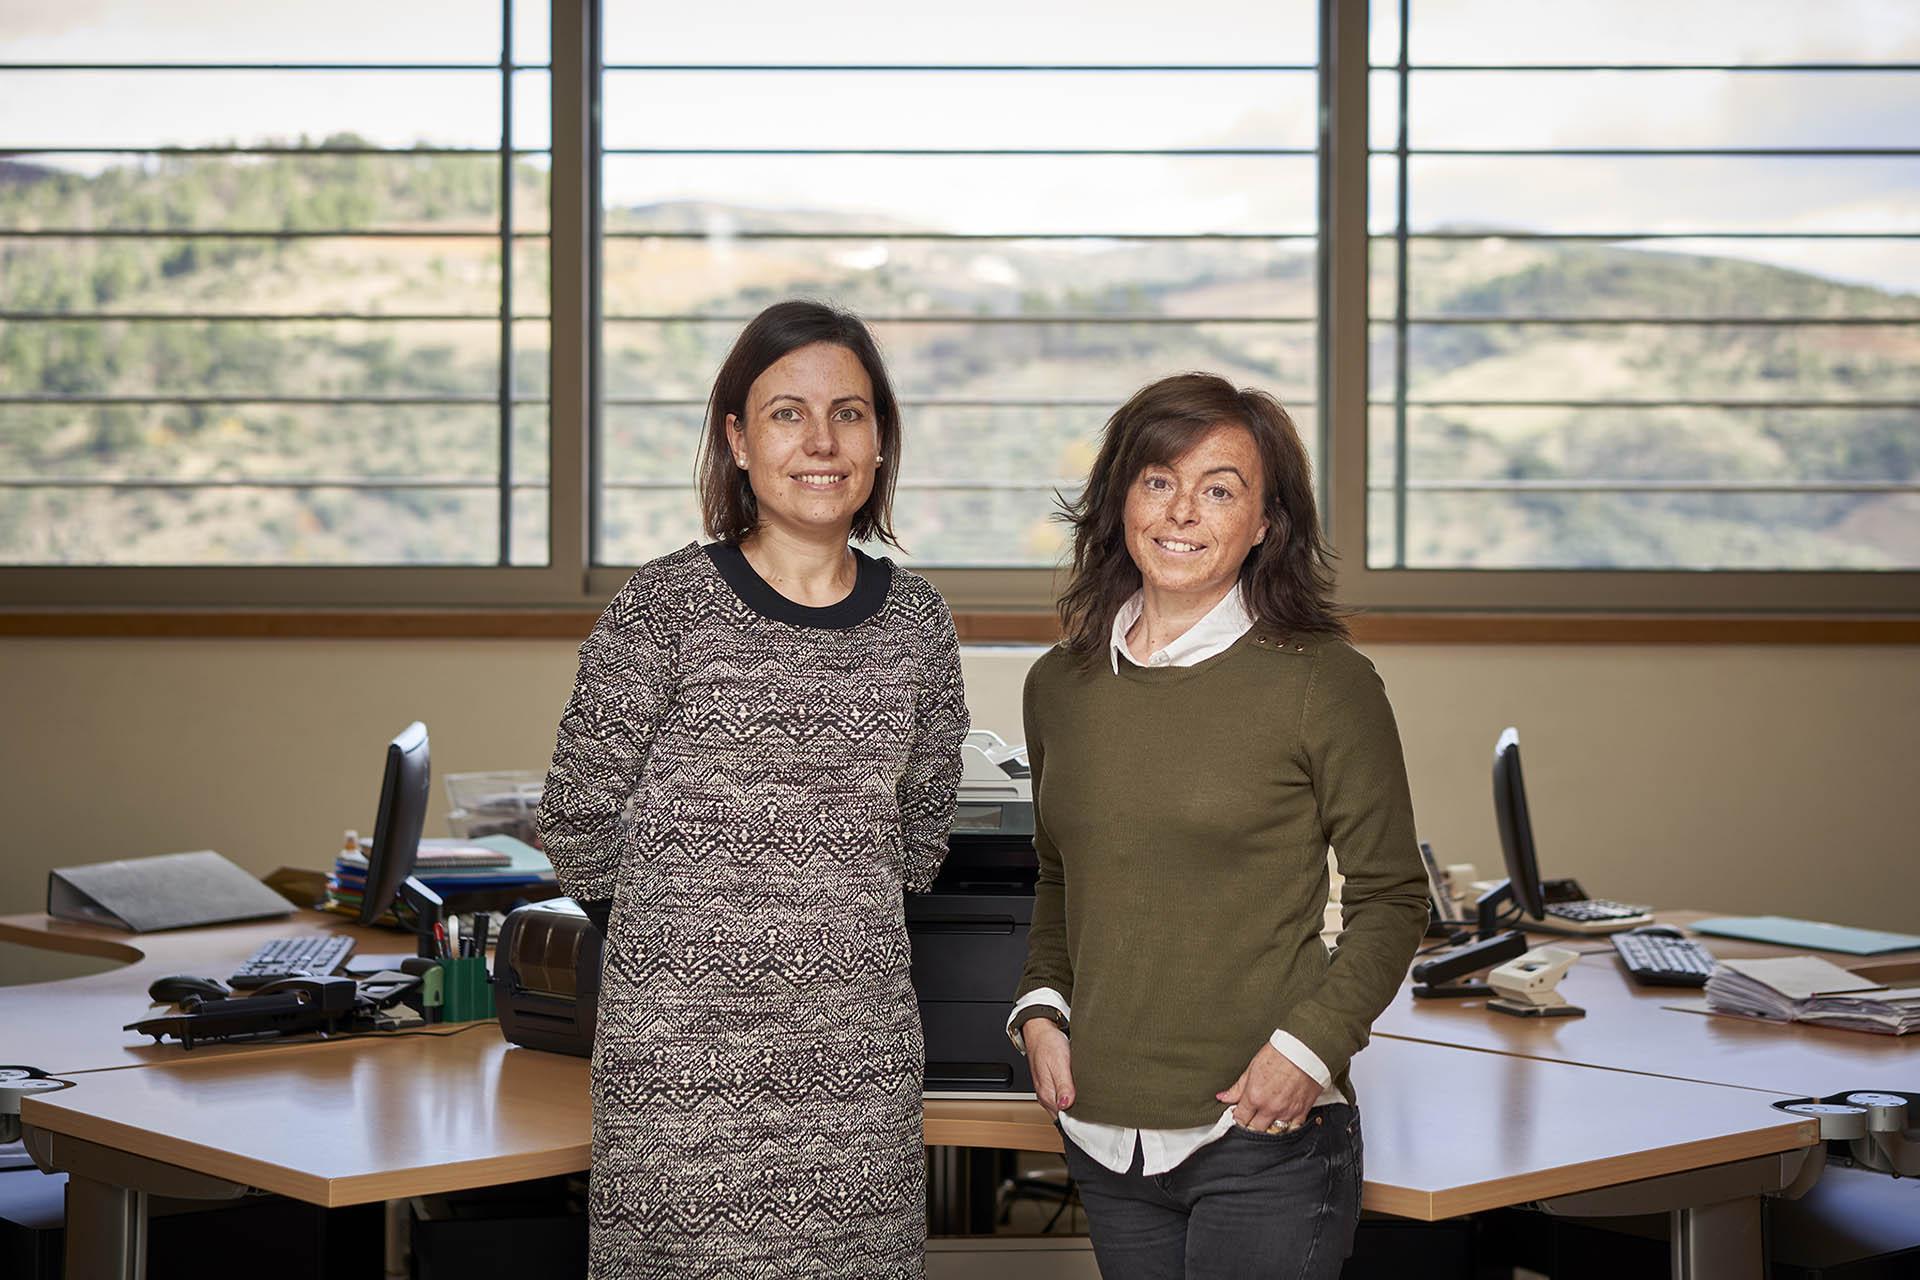 Dina Oliveira and Estrela Araújo